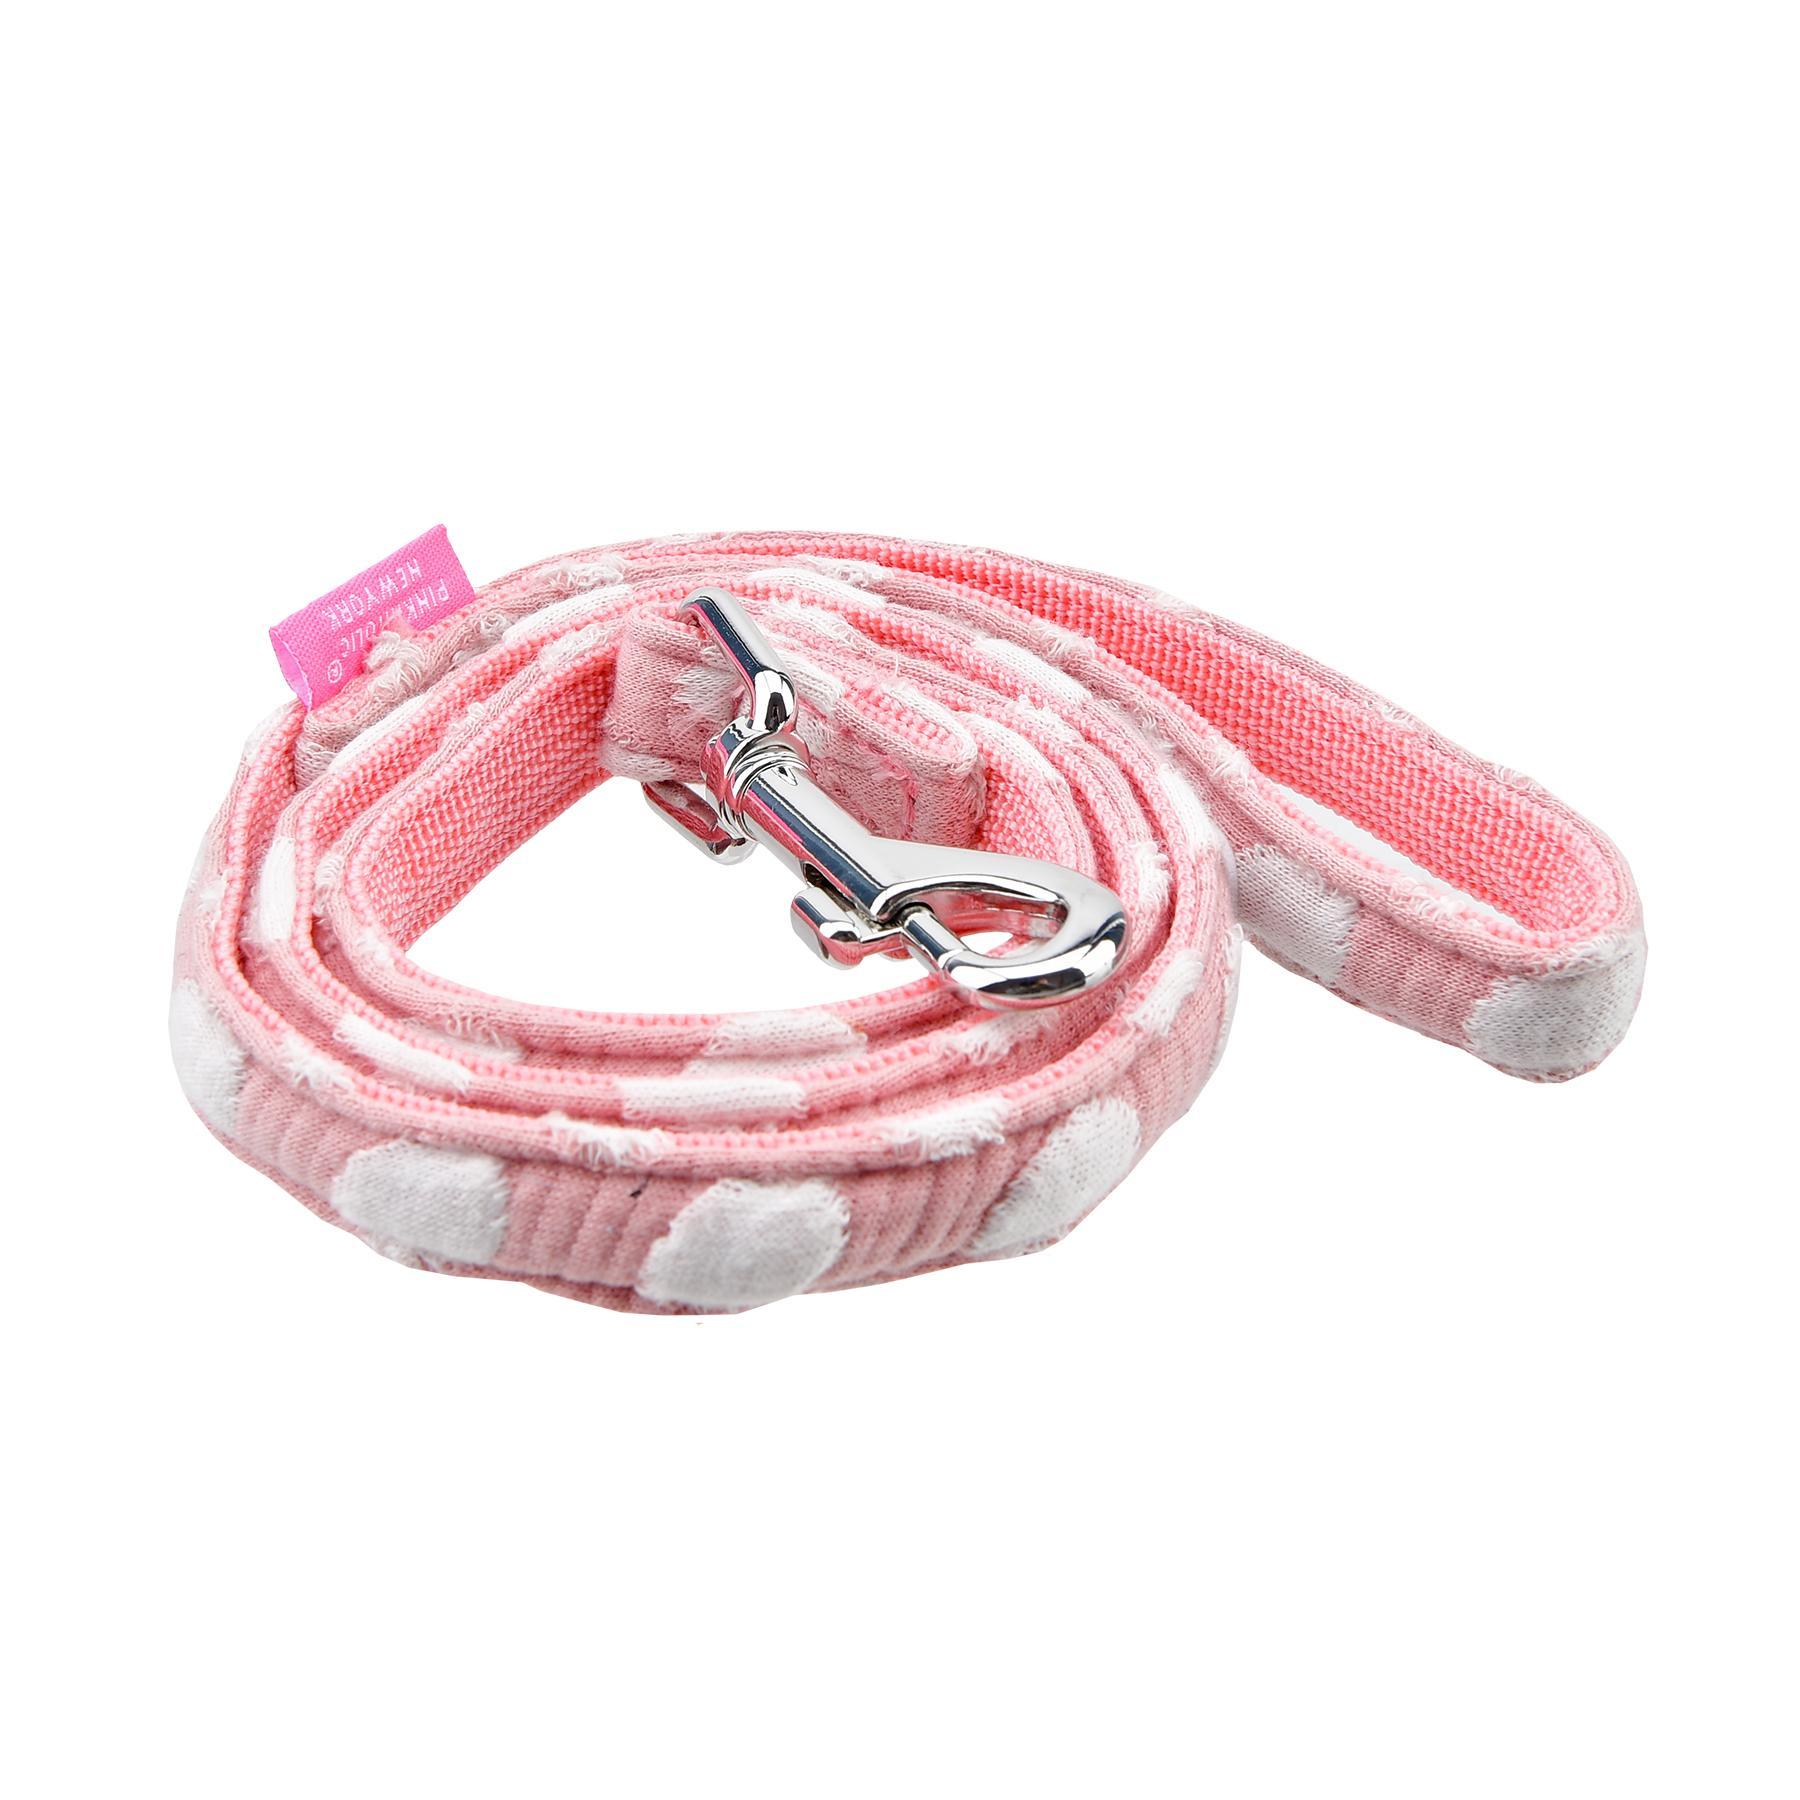 Joceline Dog Leash By Pinkaholic - Pink